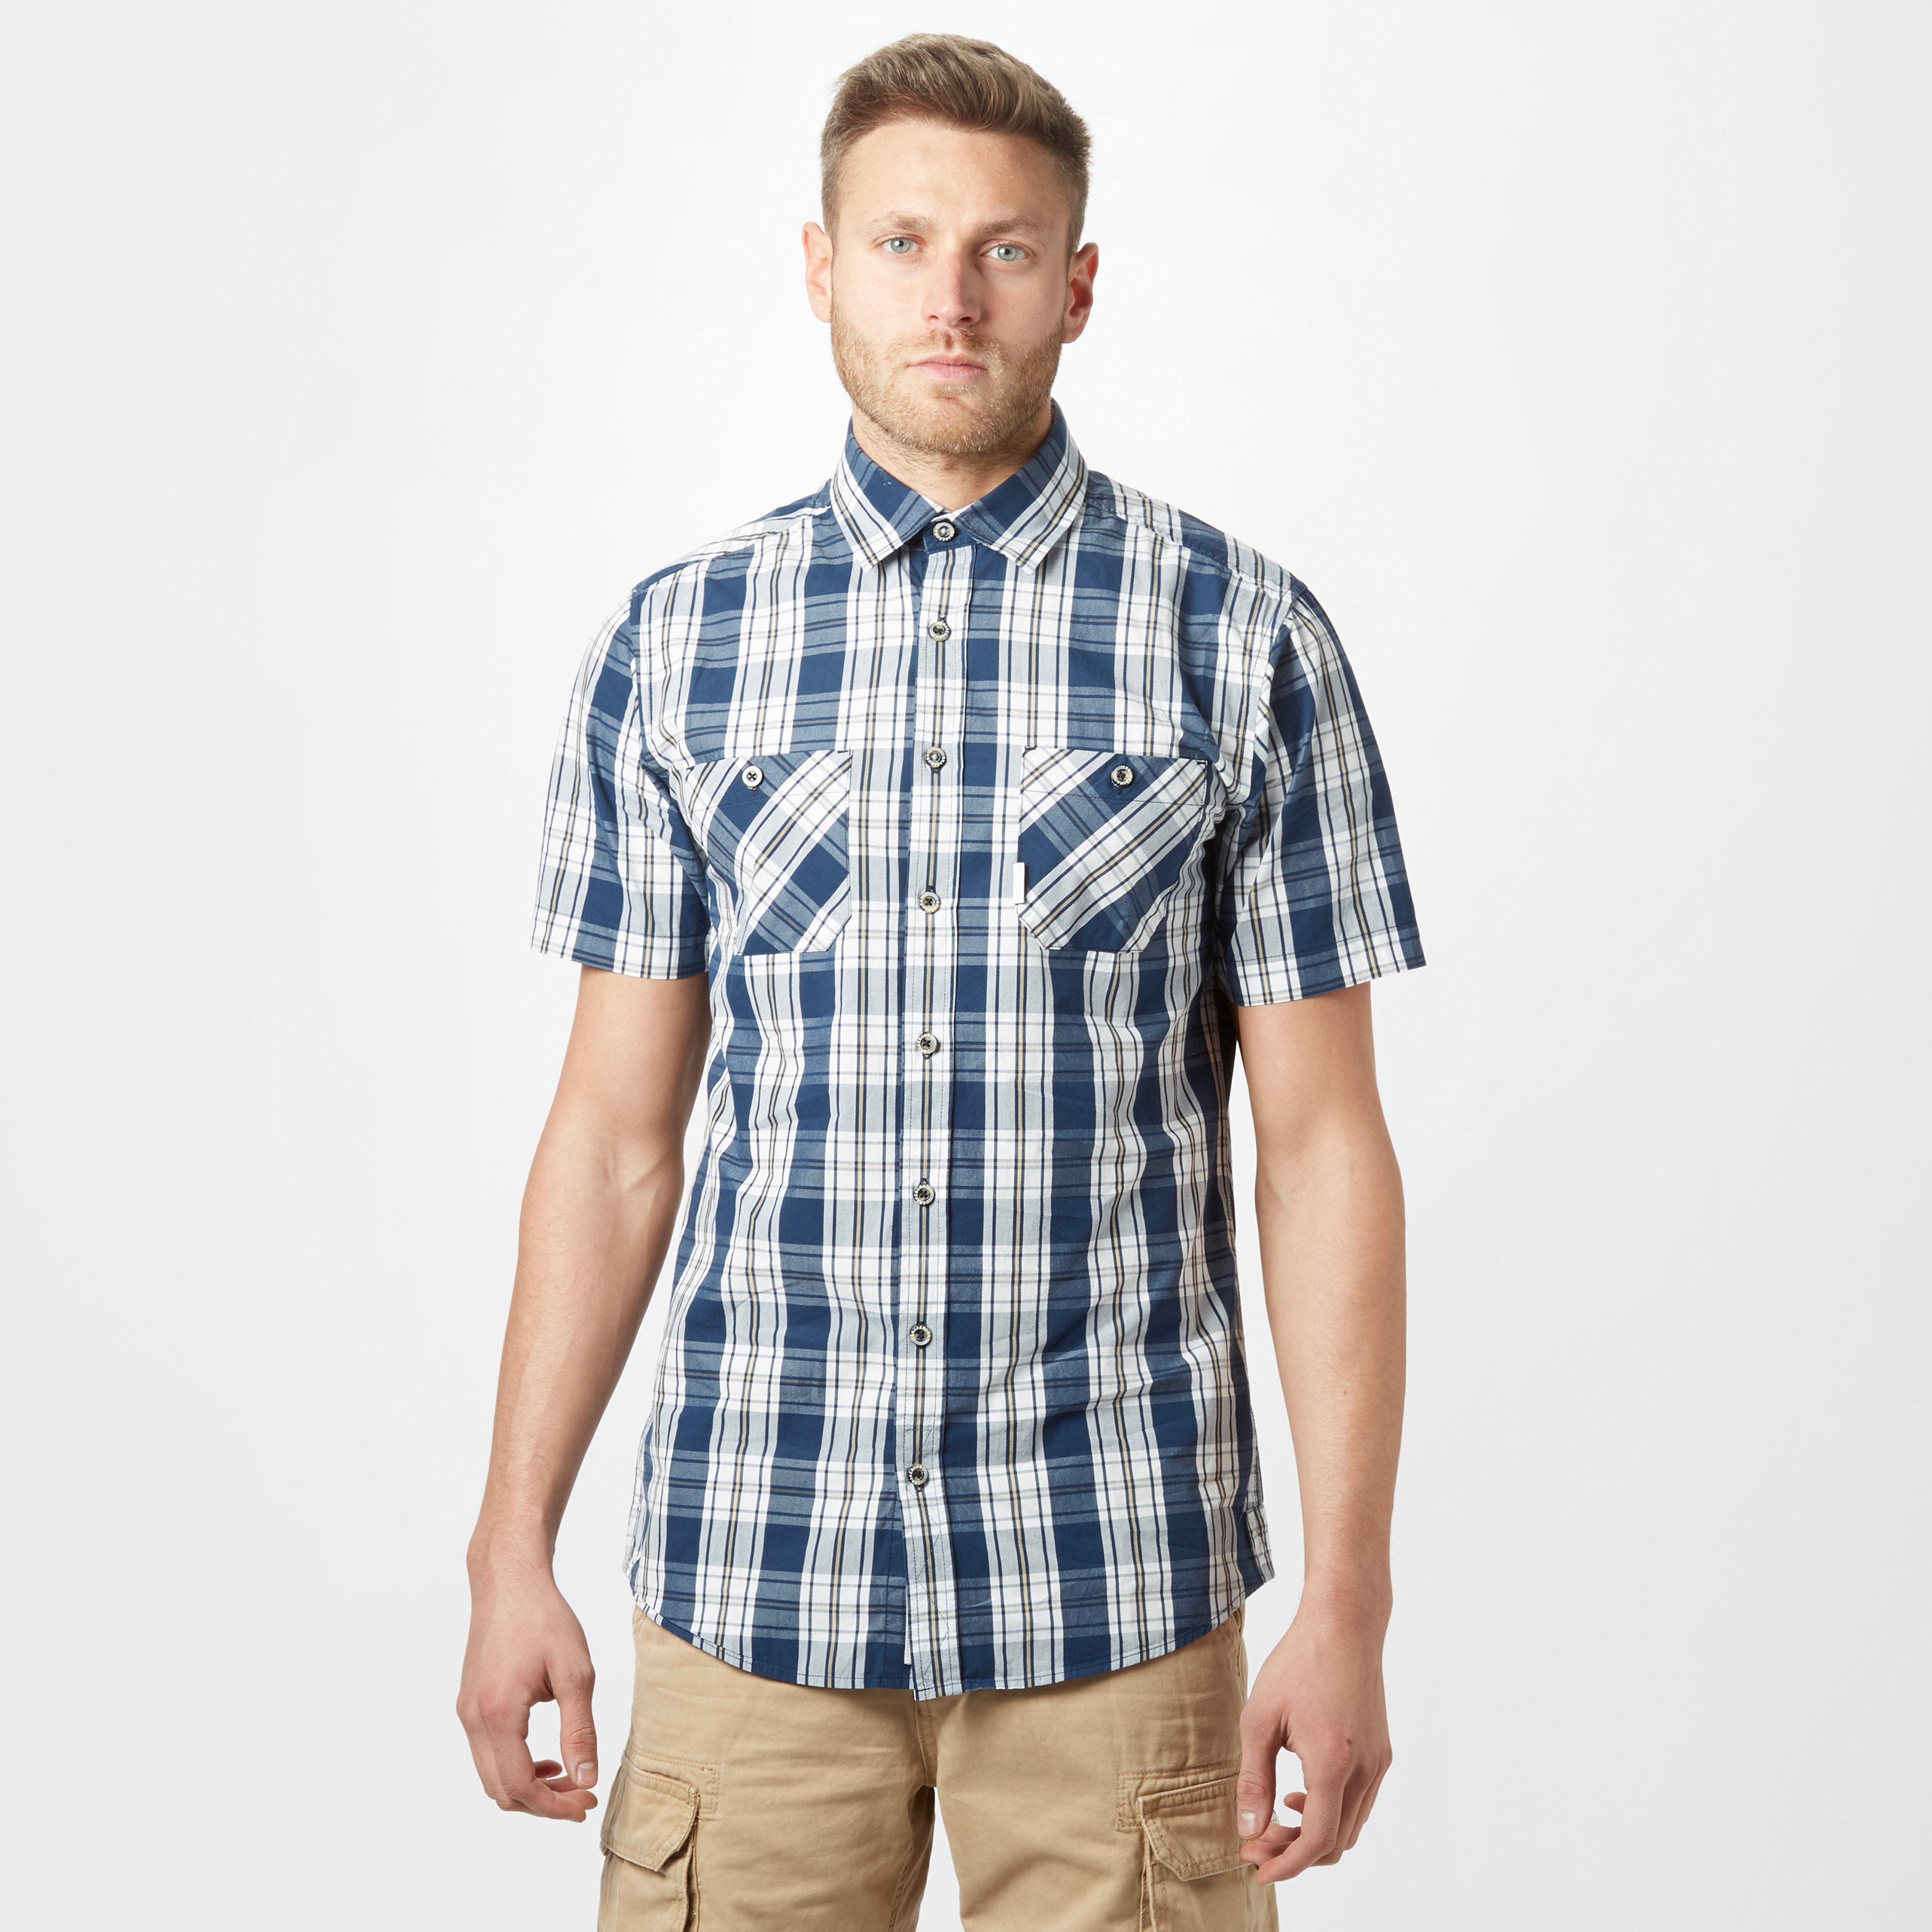 Brakeburn Brakeburn Mens Check Short Sleeve Shirt - Navy, Navy